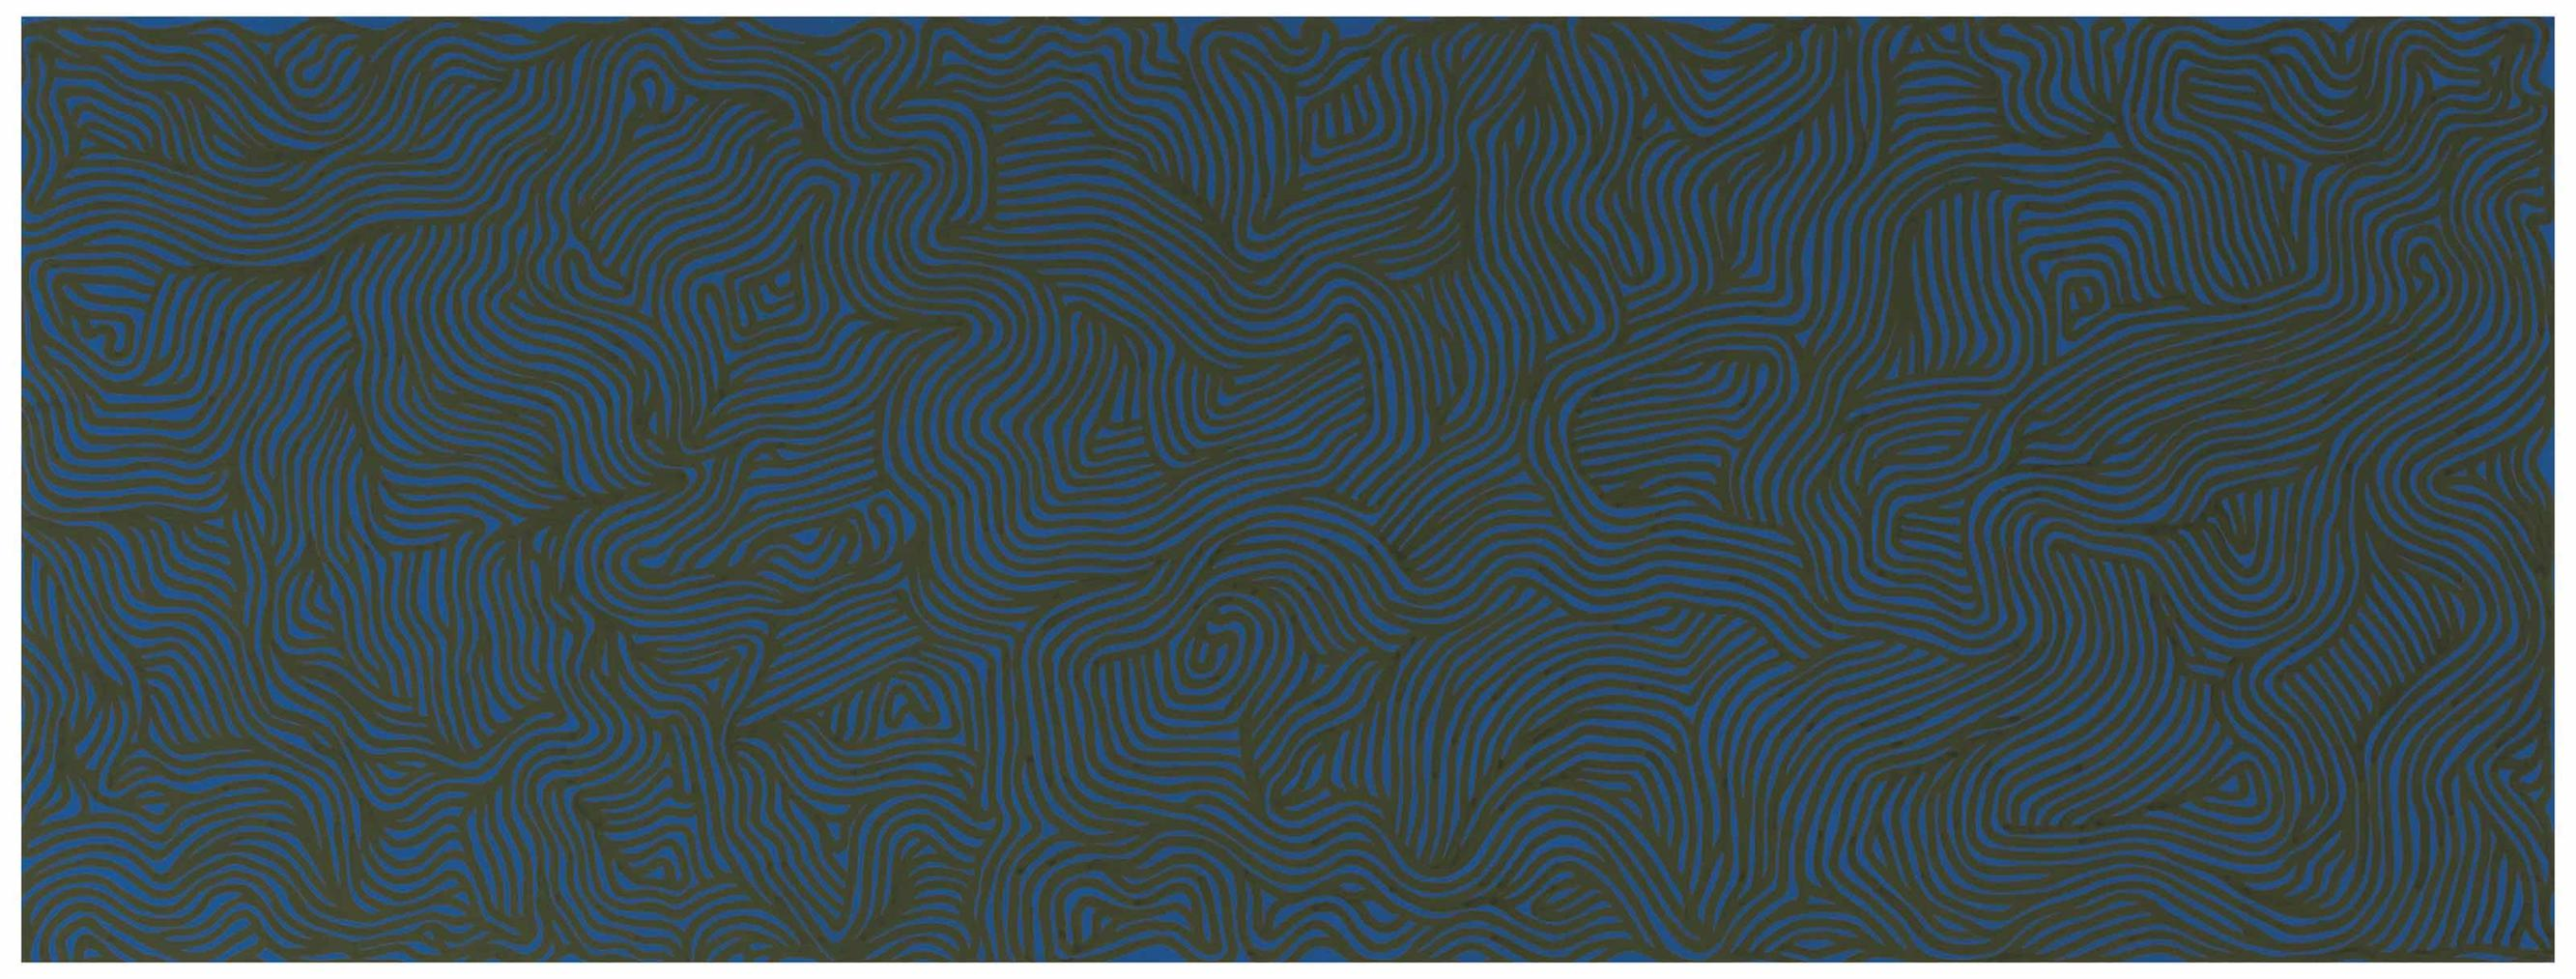 Sol LeWitt-Irregular Curves-2000